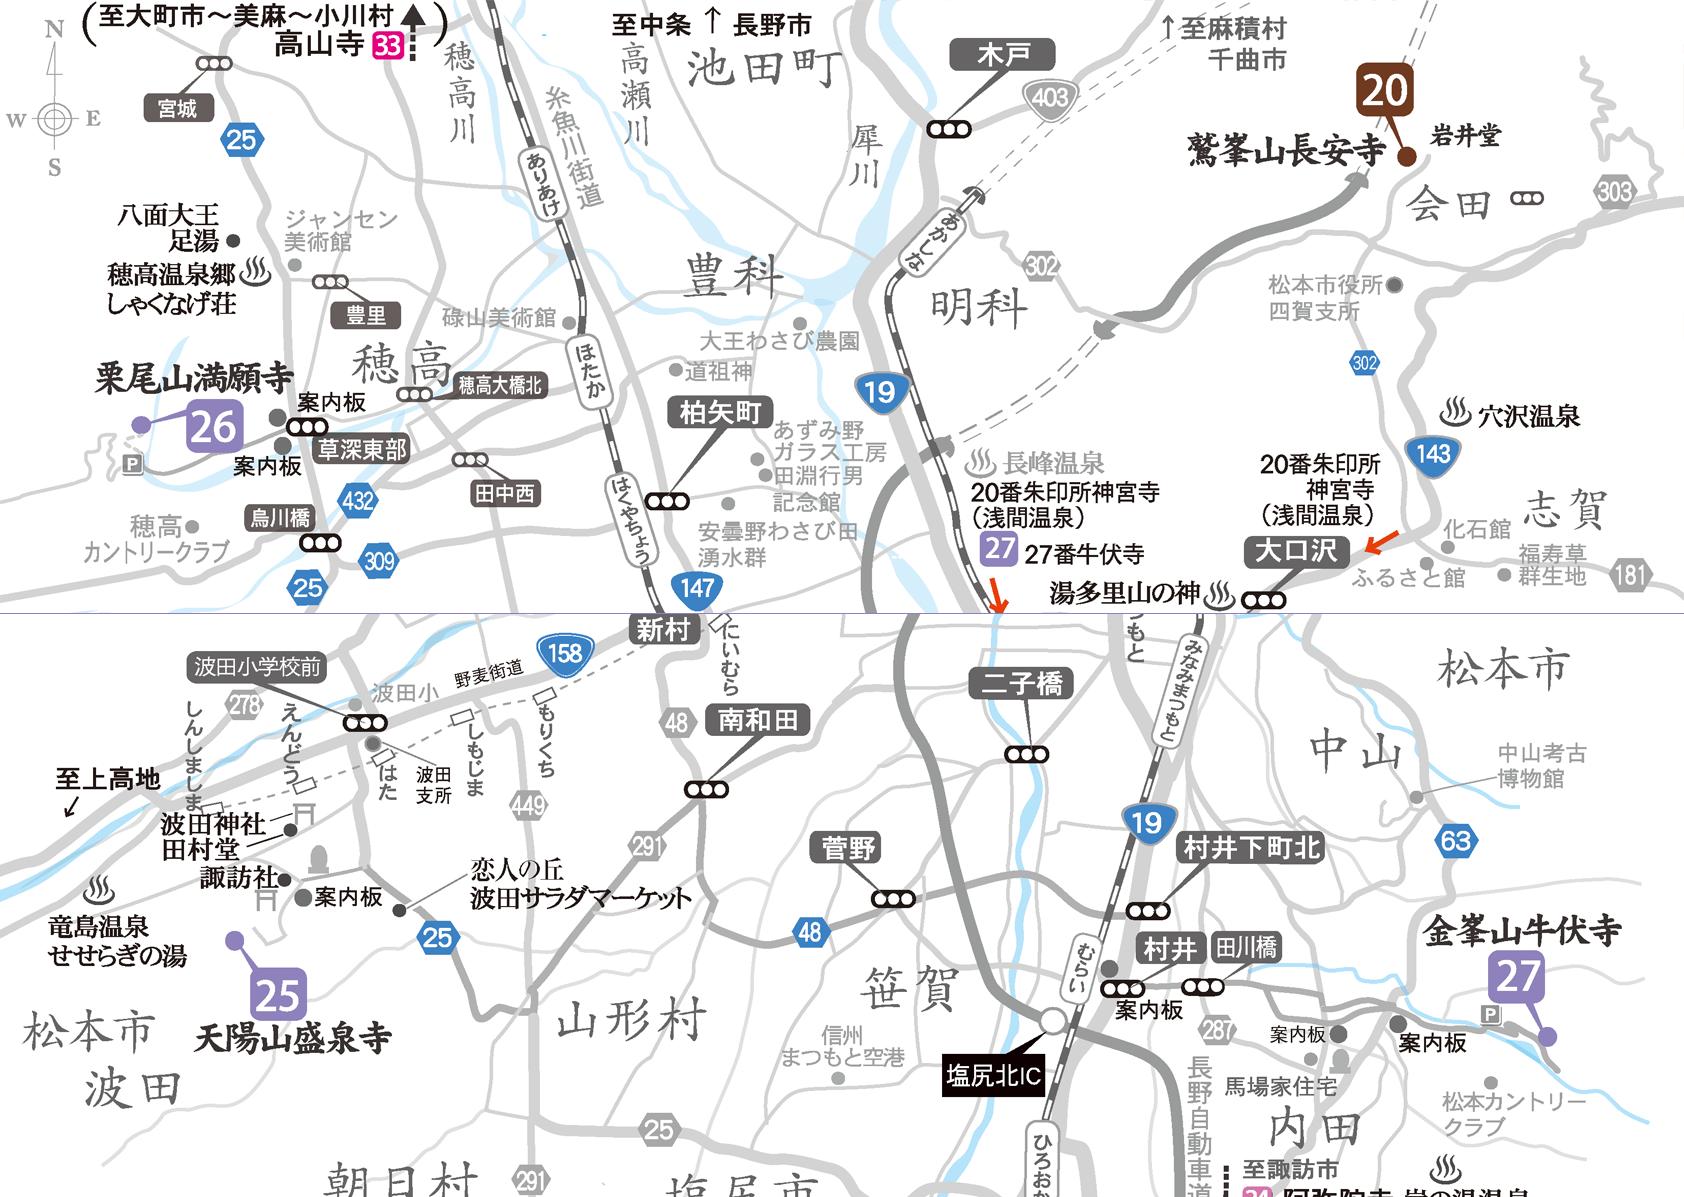 善光寺街道(松本・安曇野)エリア地図